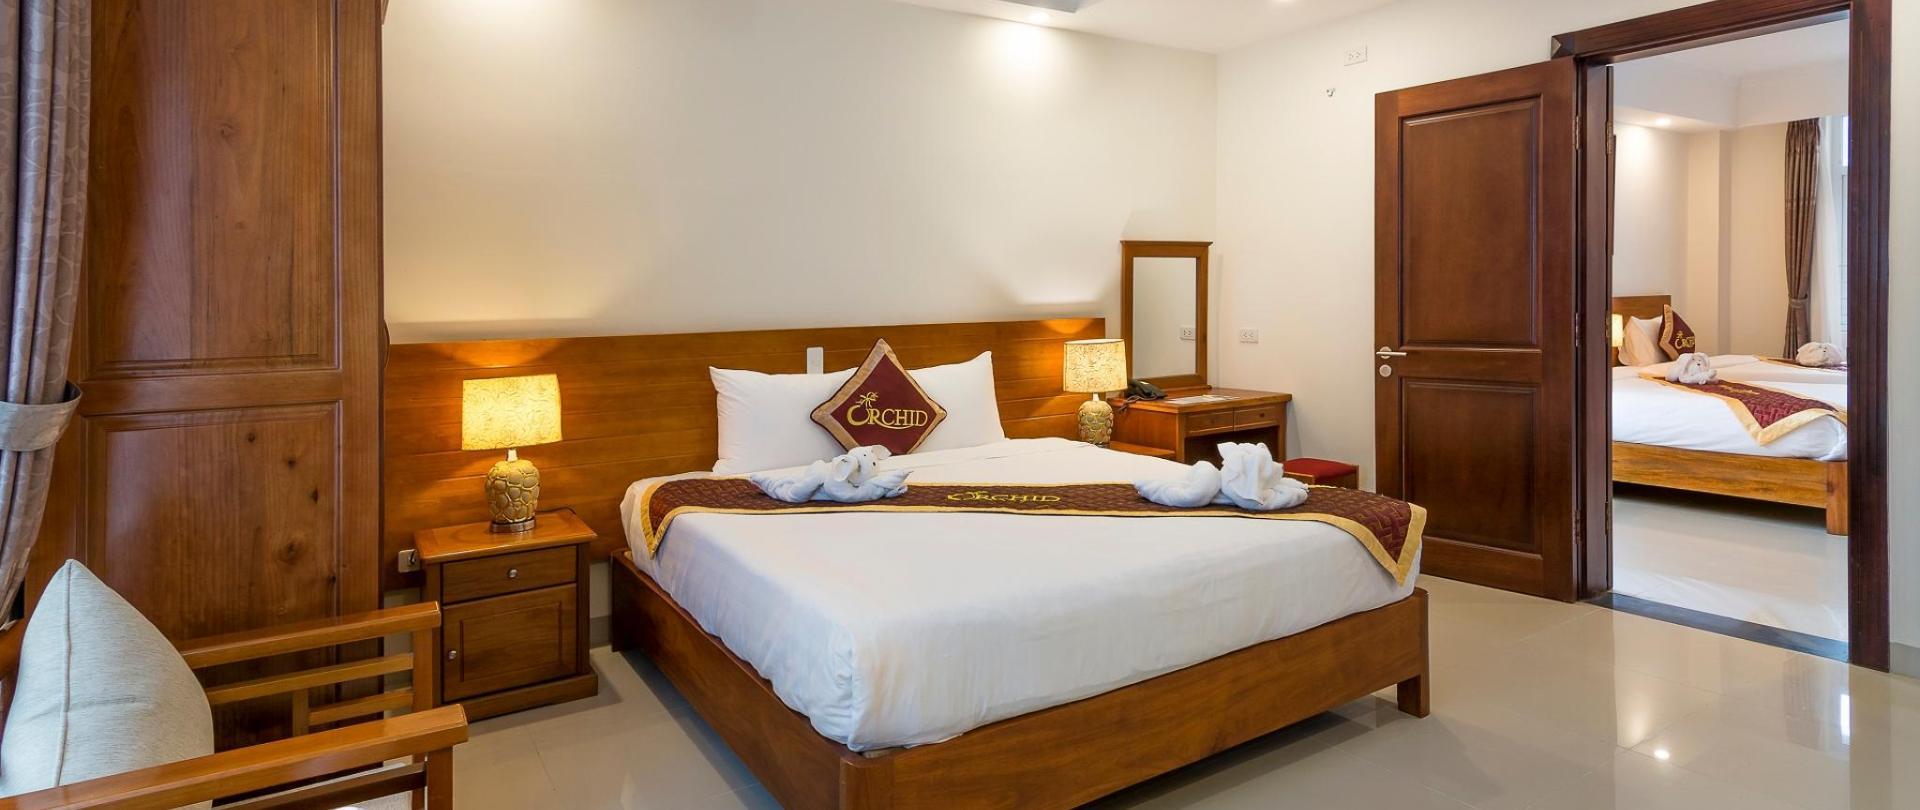 Orchid Hotel Da Nang